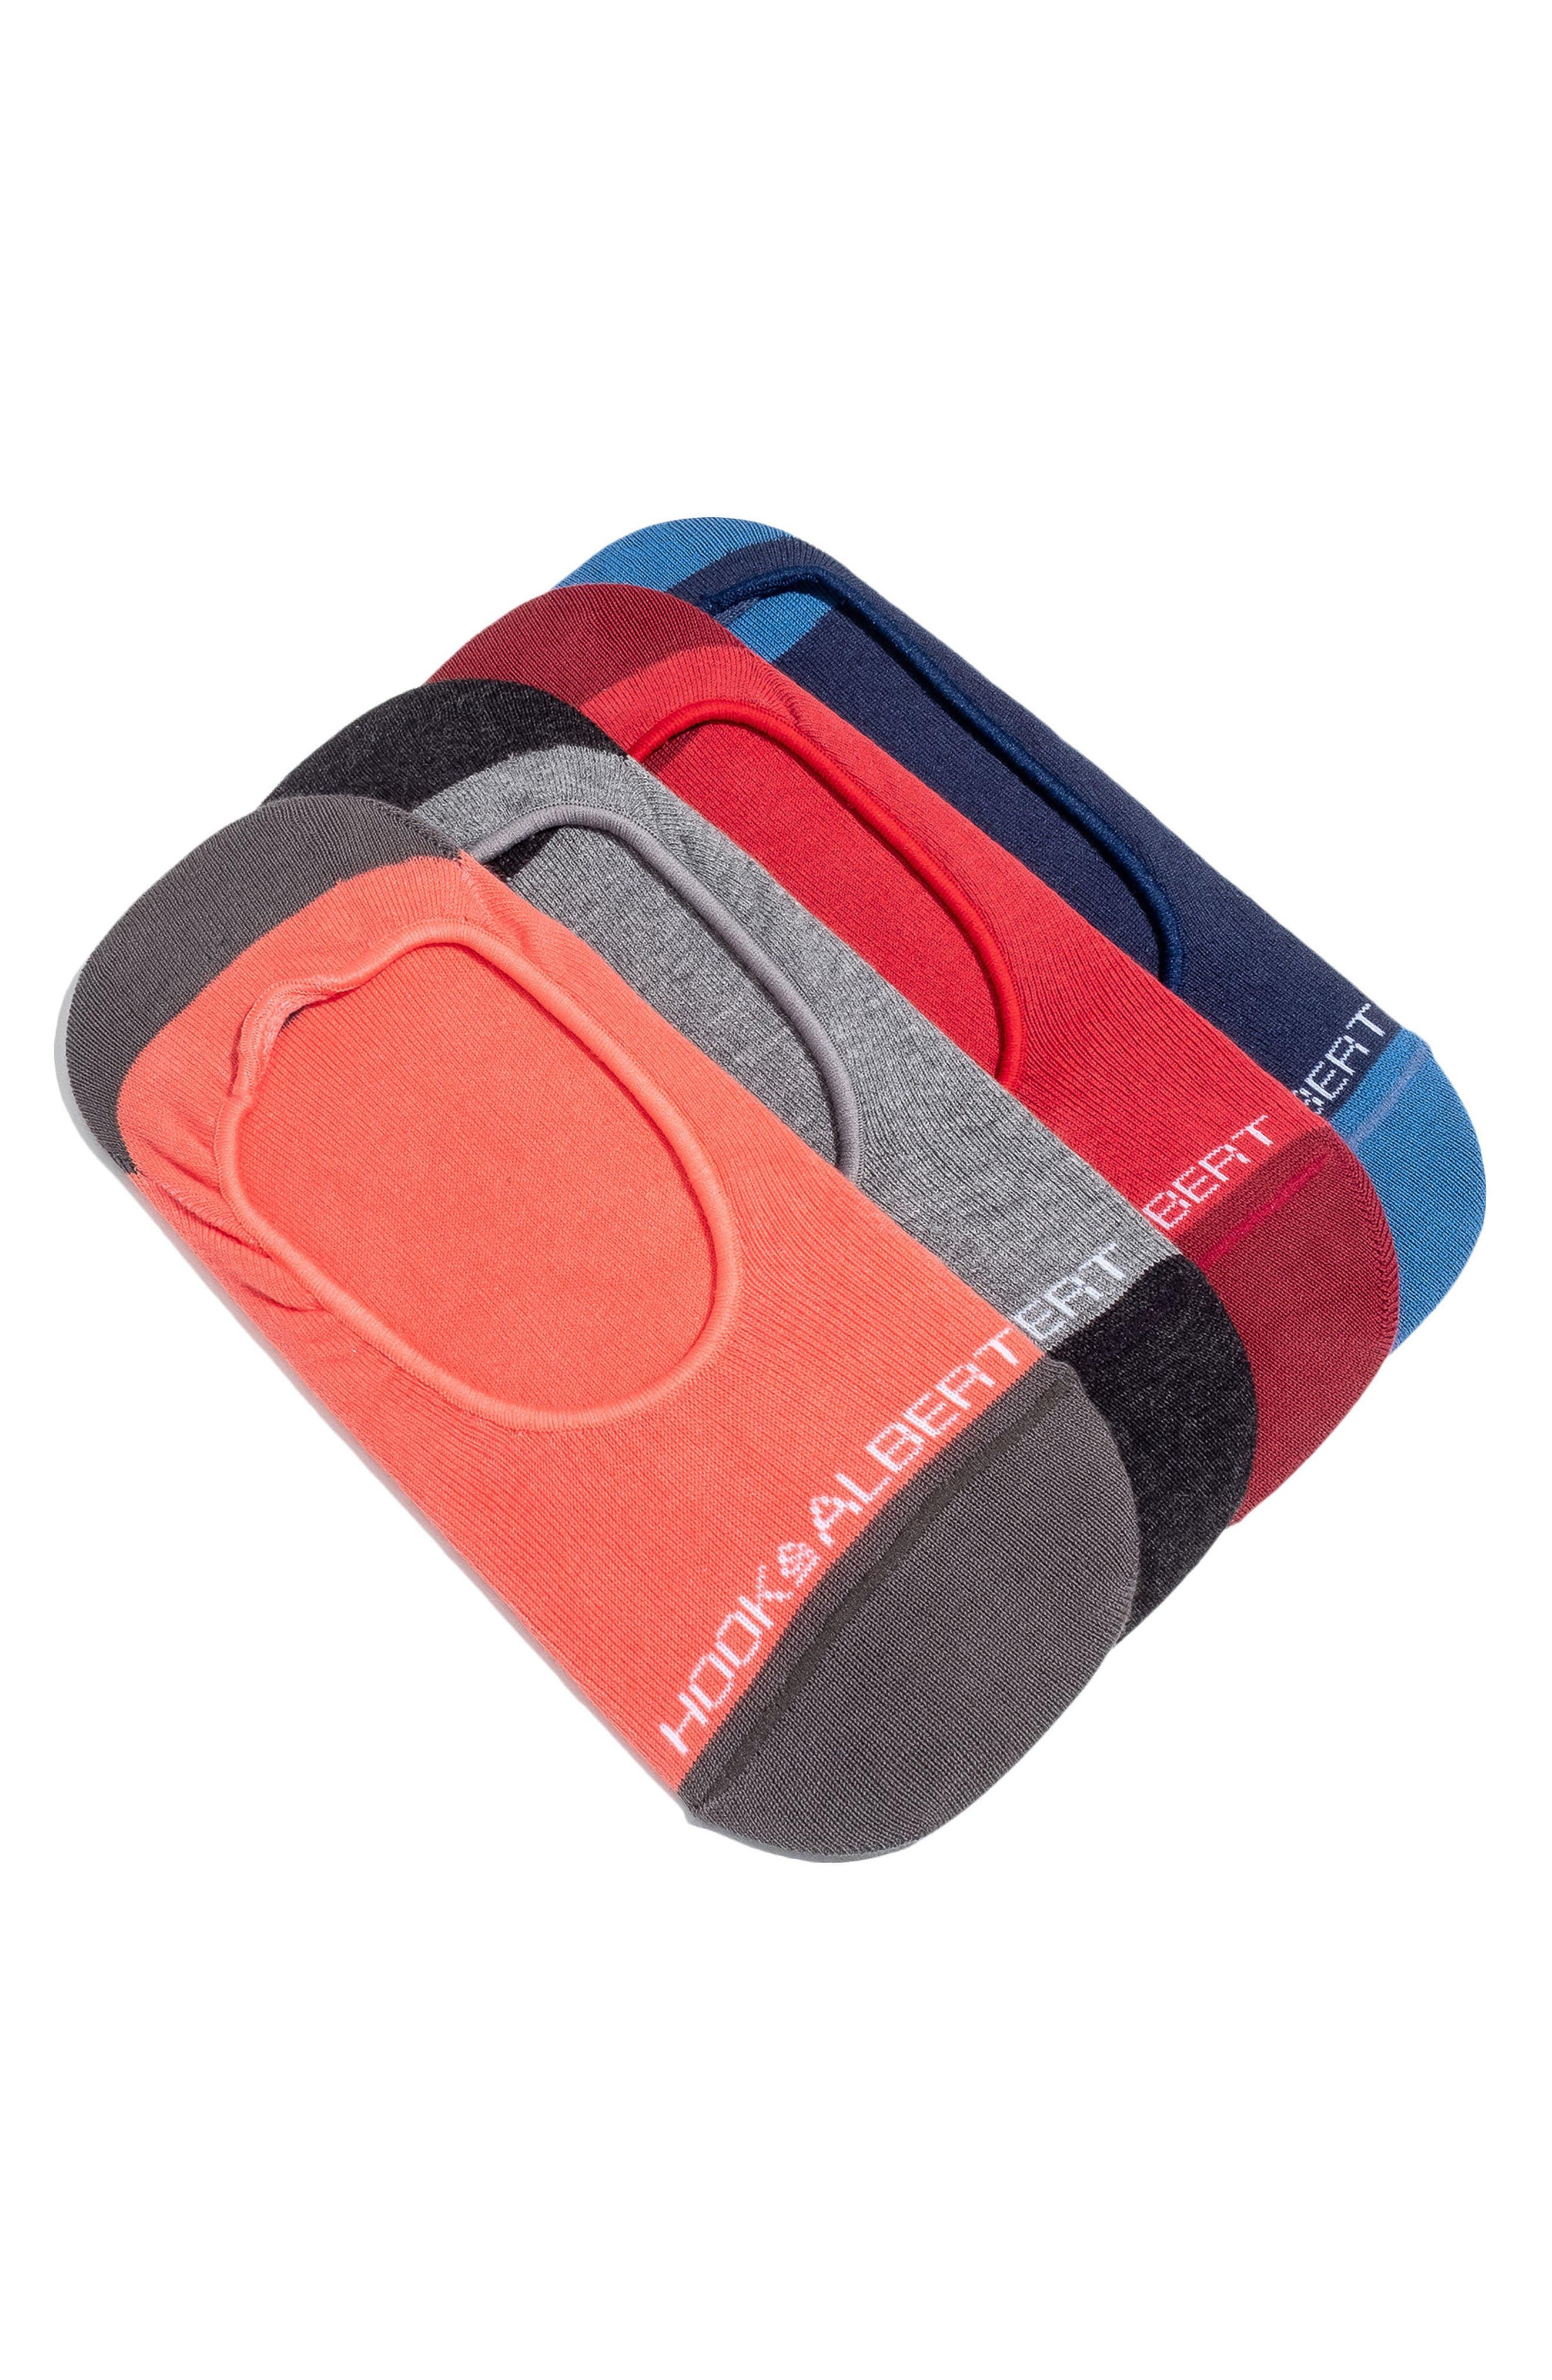 4-Pack Liner Socks,                             Main thumbnail 1, color,                             Red